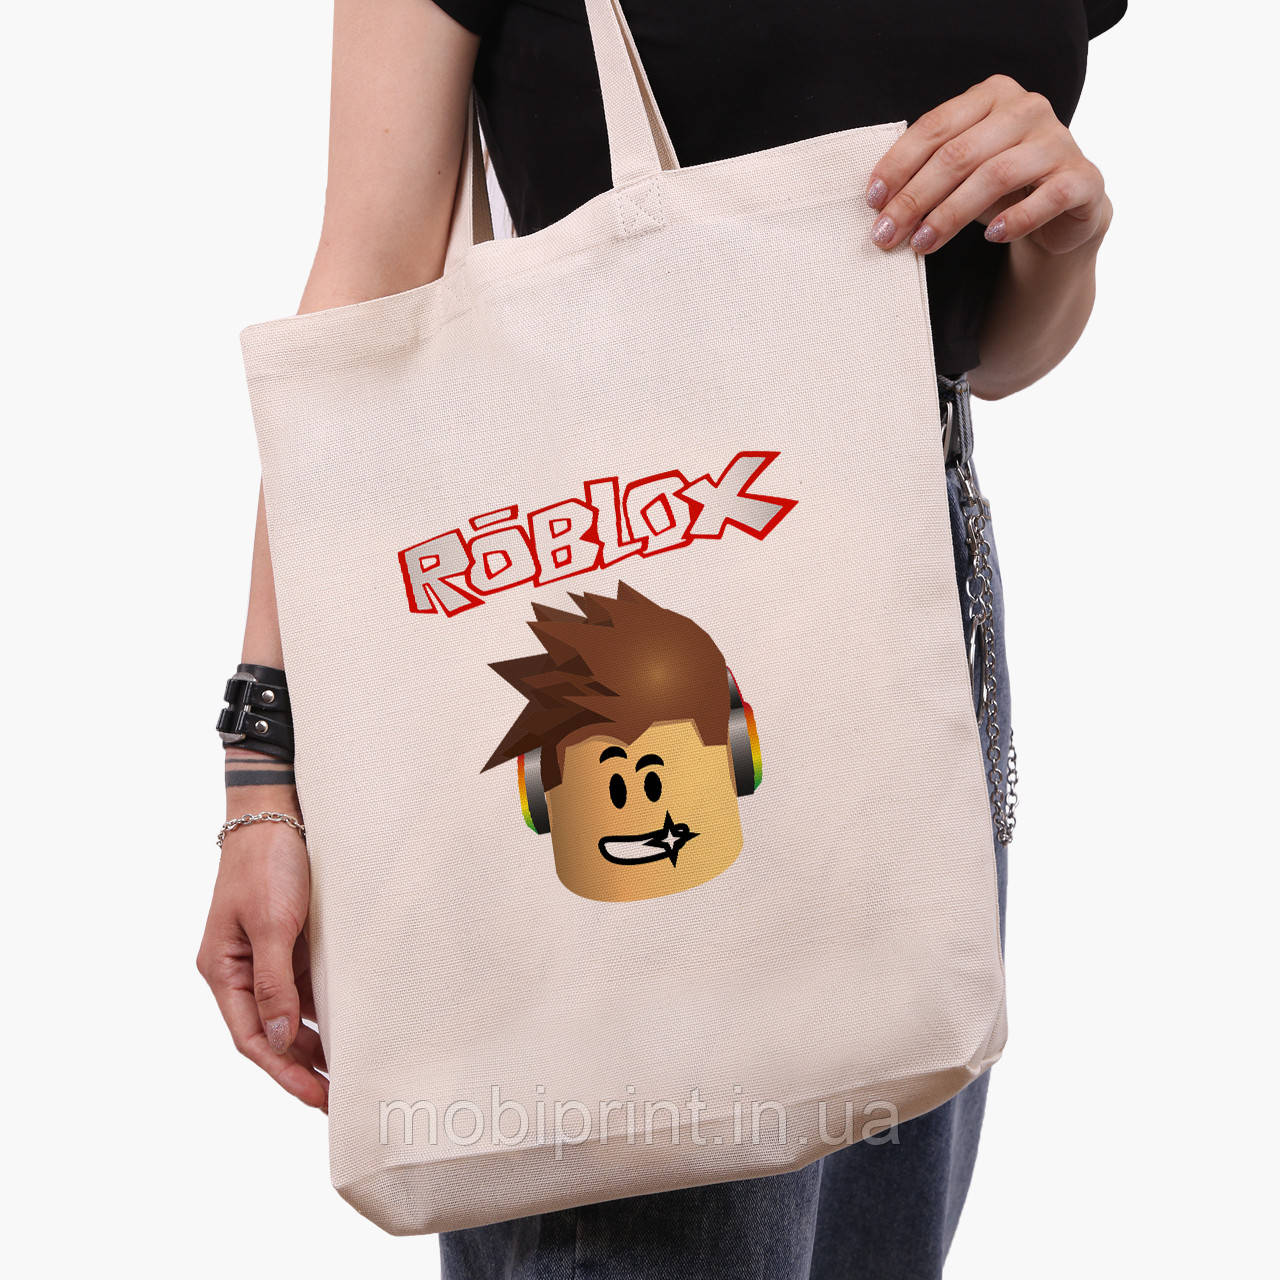 Эко сумка шоппер белая Роблокс (Roblox) (9227-1713-1)  экосумка шопер 41*39*8 см